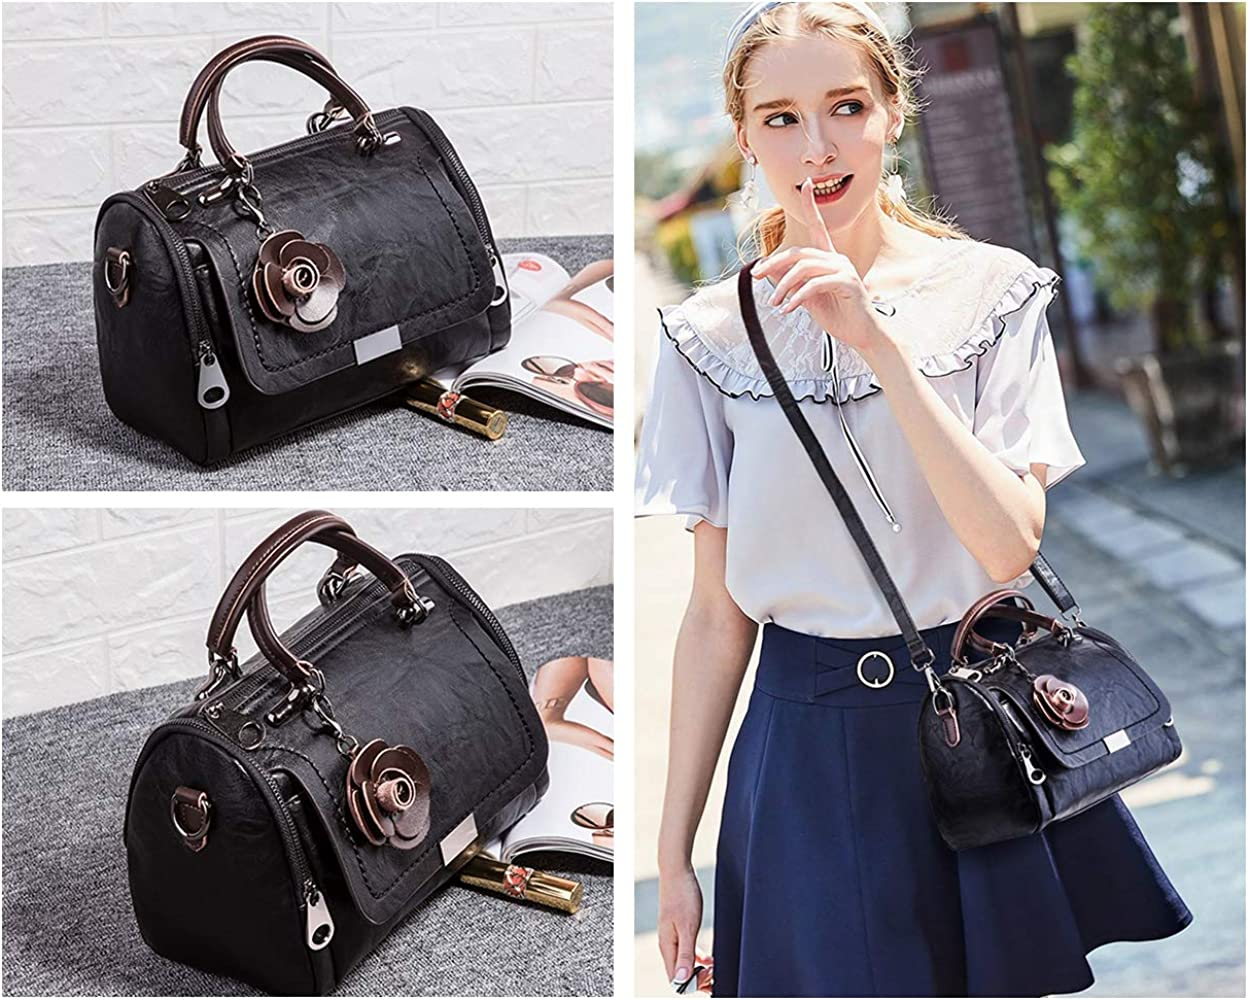 Mn&Sue Barrel Style Handbags for Women Small Top Handle Satchel Crossbody Ladies Leather Purse